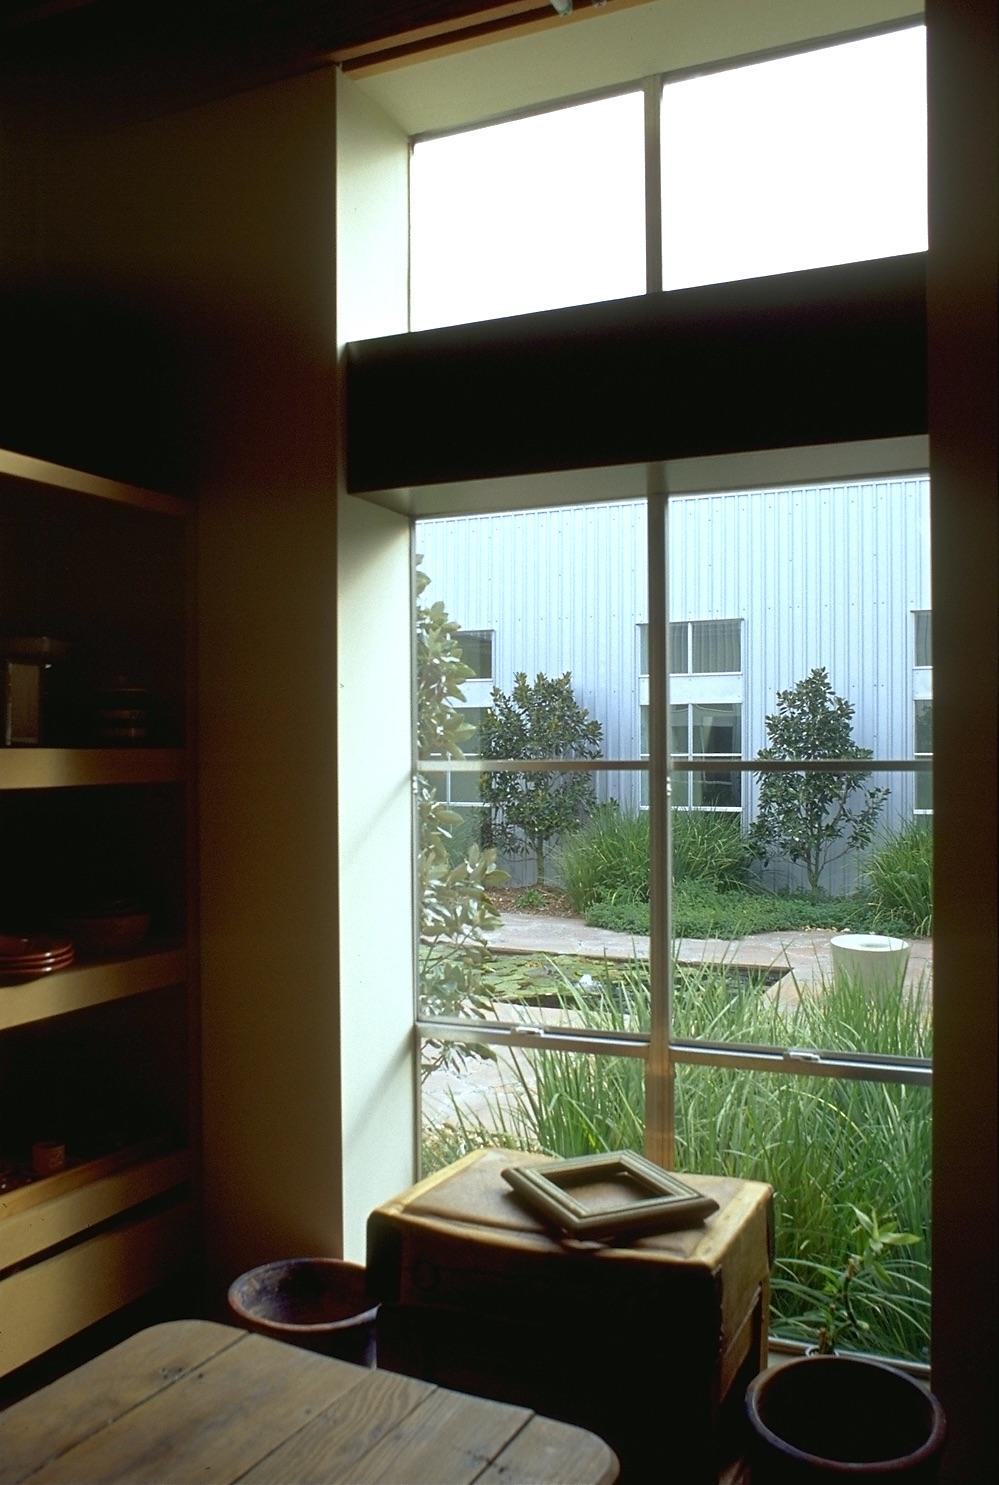 SMITH-props w: window.jpg